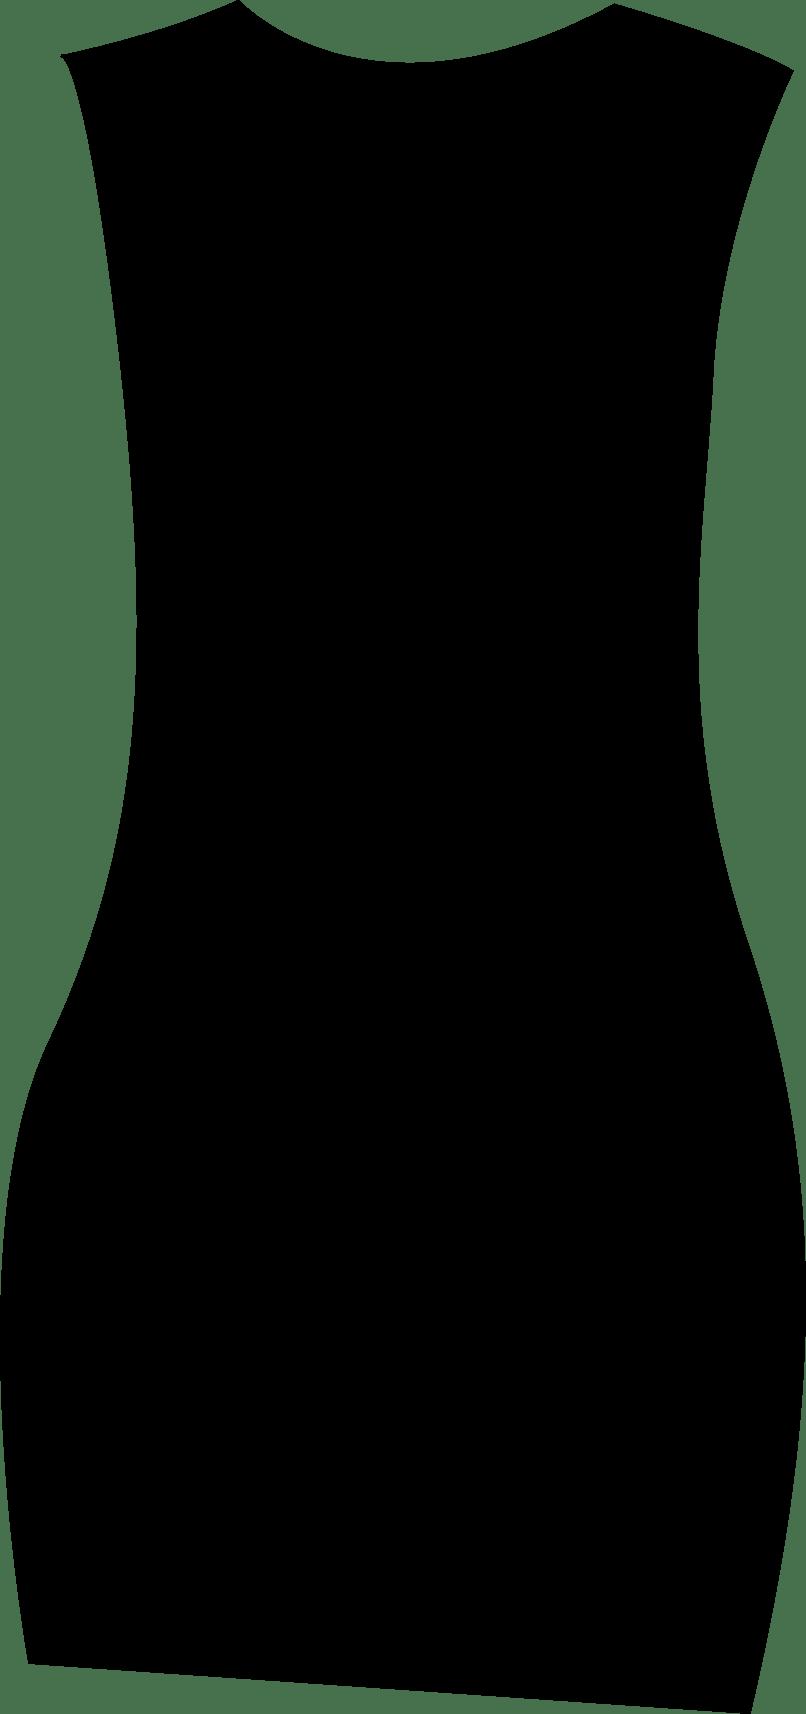 Cd cutton garments. Neck clipart body back